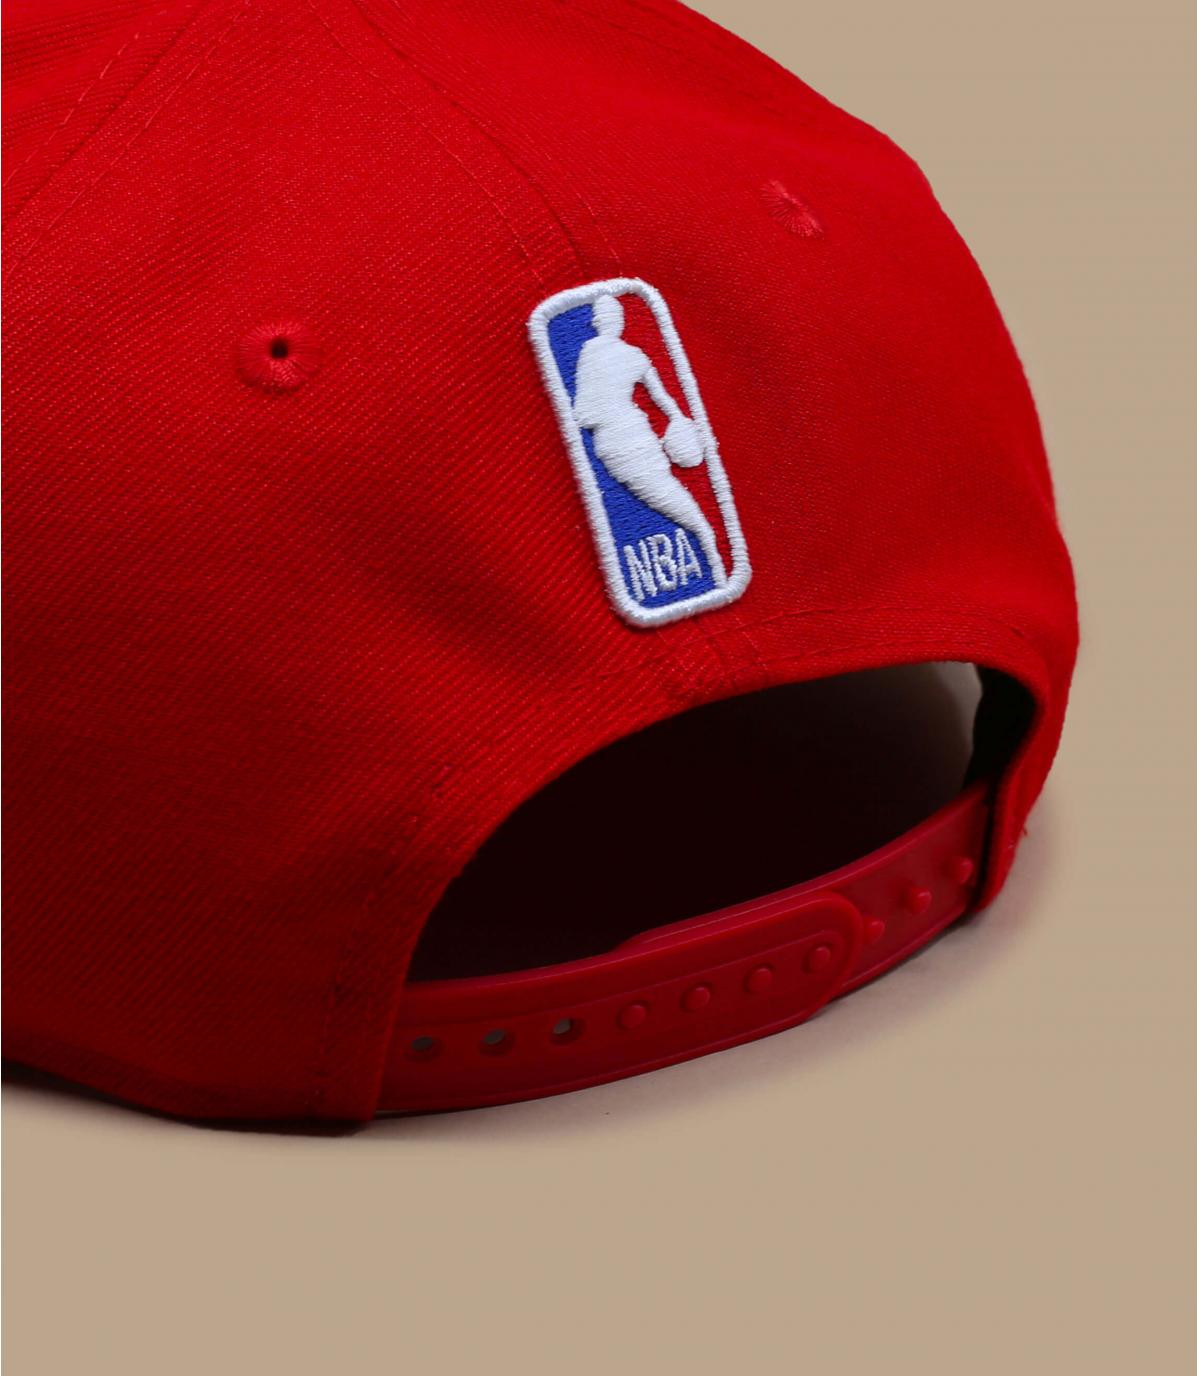 Details Snapback NBA Draft Bulls 950 - afbeeling 4